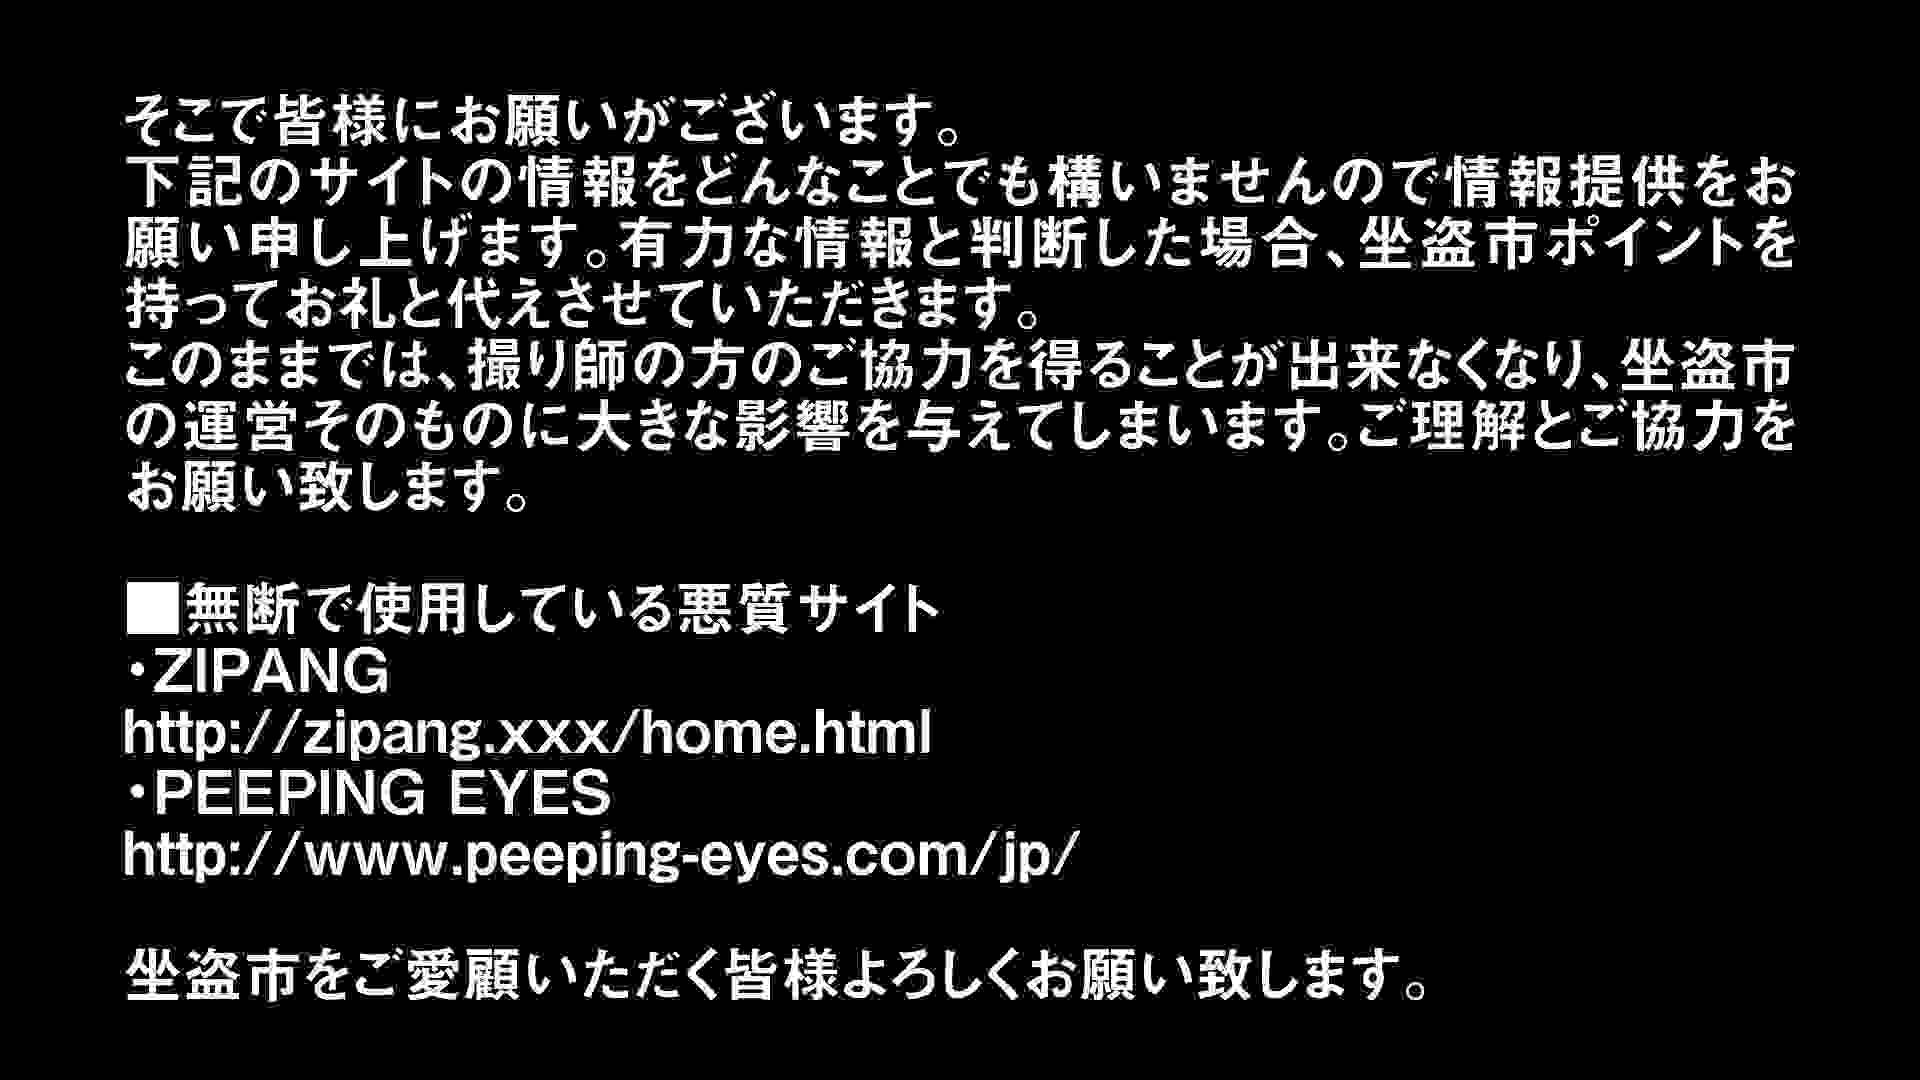 Aquaな露天風呂Vol.300 盗撮  83連発 30